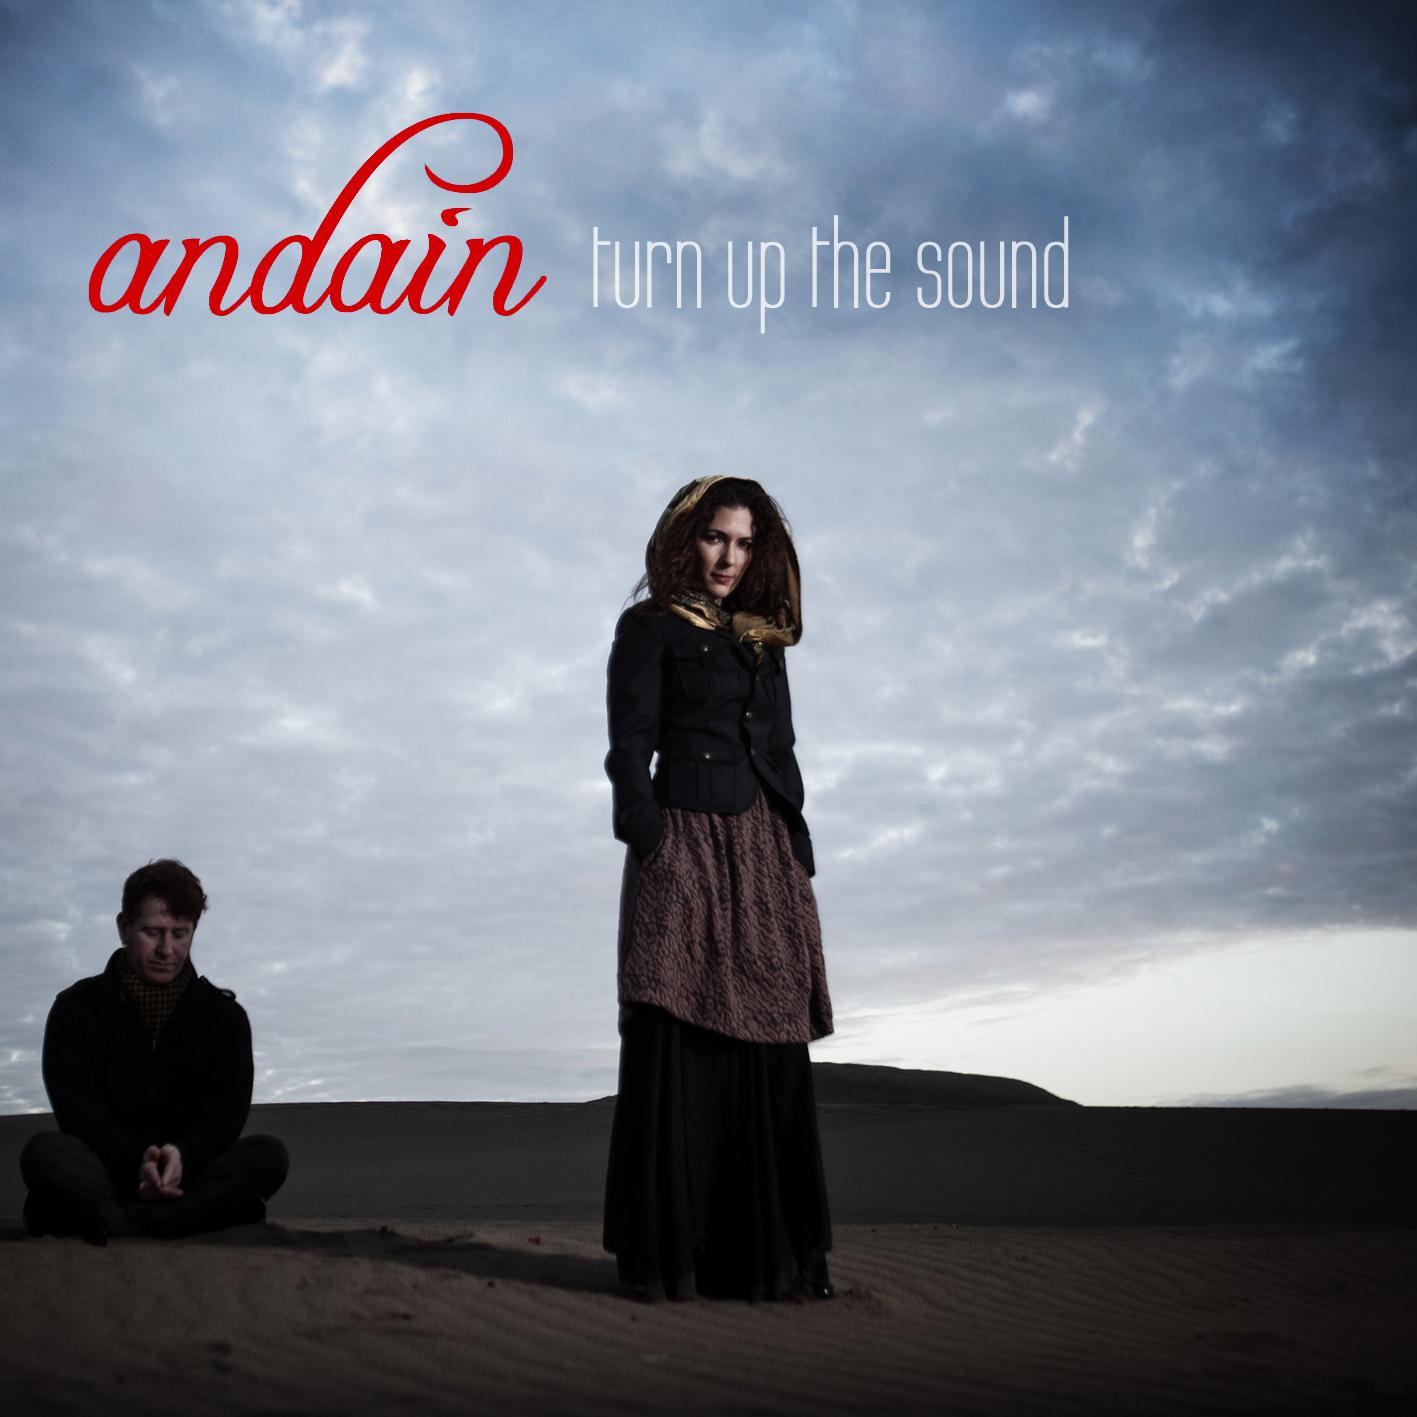 Andain-Turn-Up-The-Sound-Tristan-Garner-Remix-Youredm